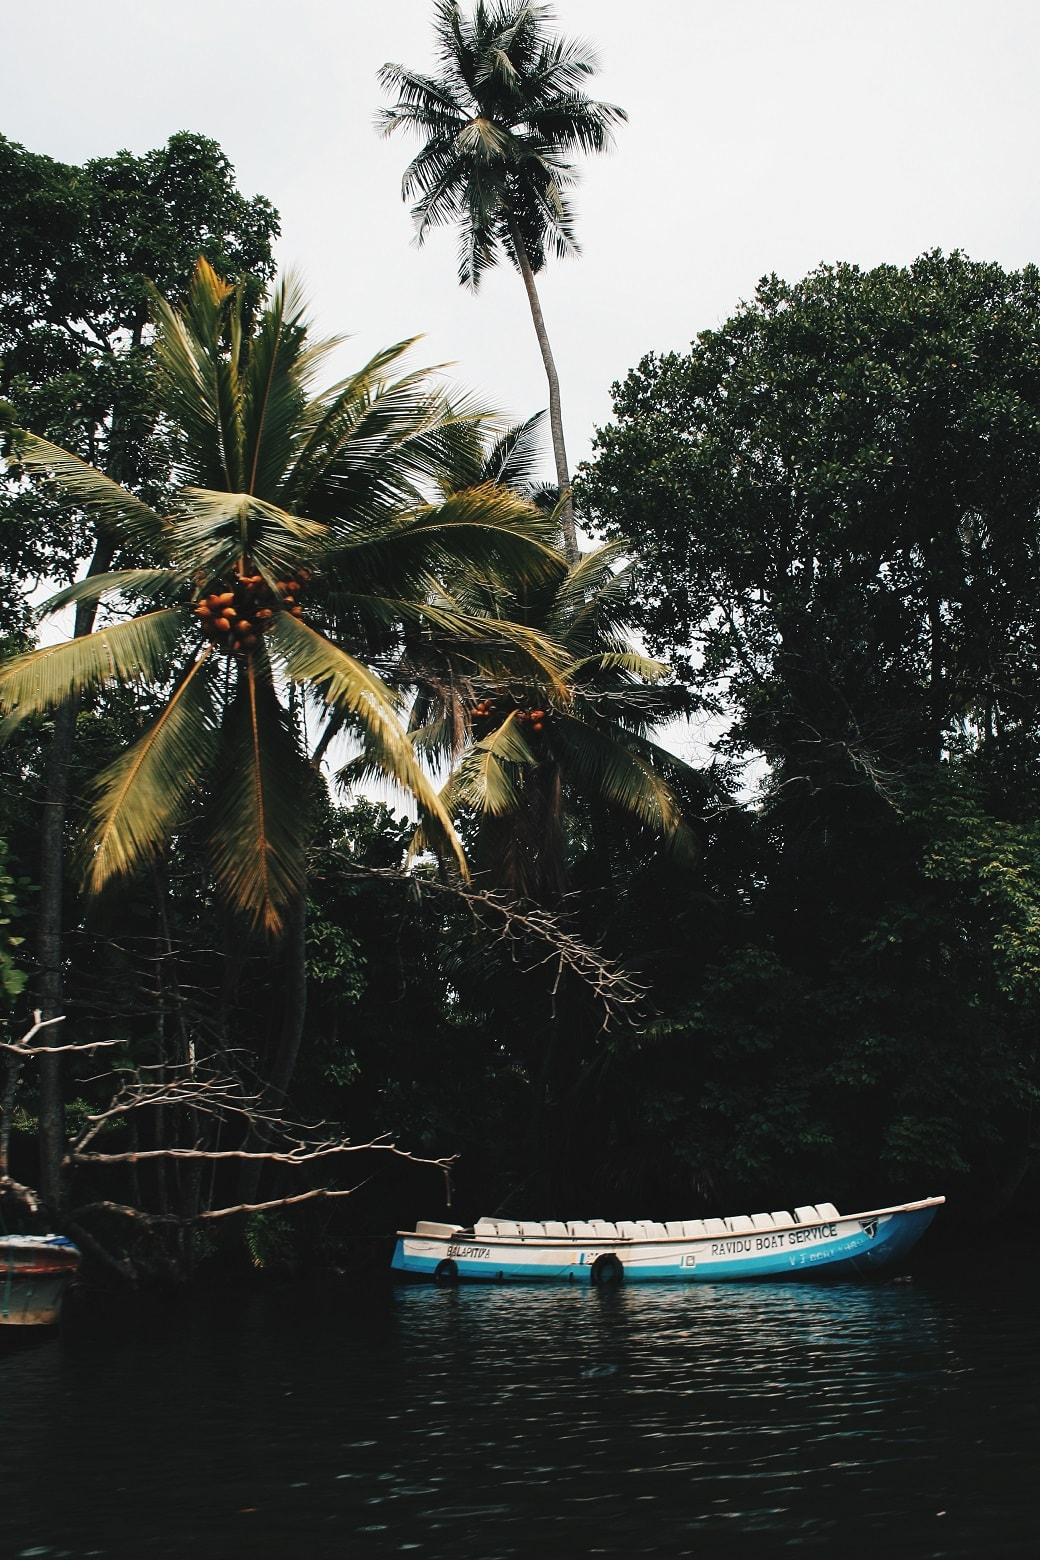 maduganga-boat-ride-sri-lanka-3